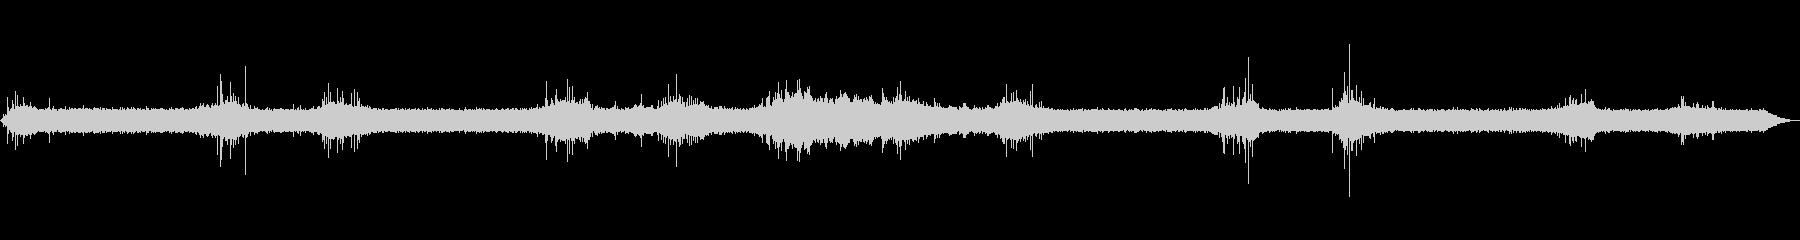 [ASMR]昆虫などが鳴いている森_06の未再生の波形